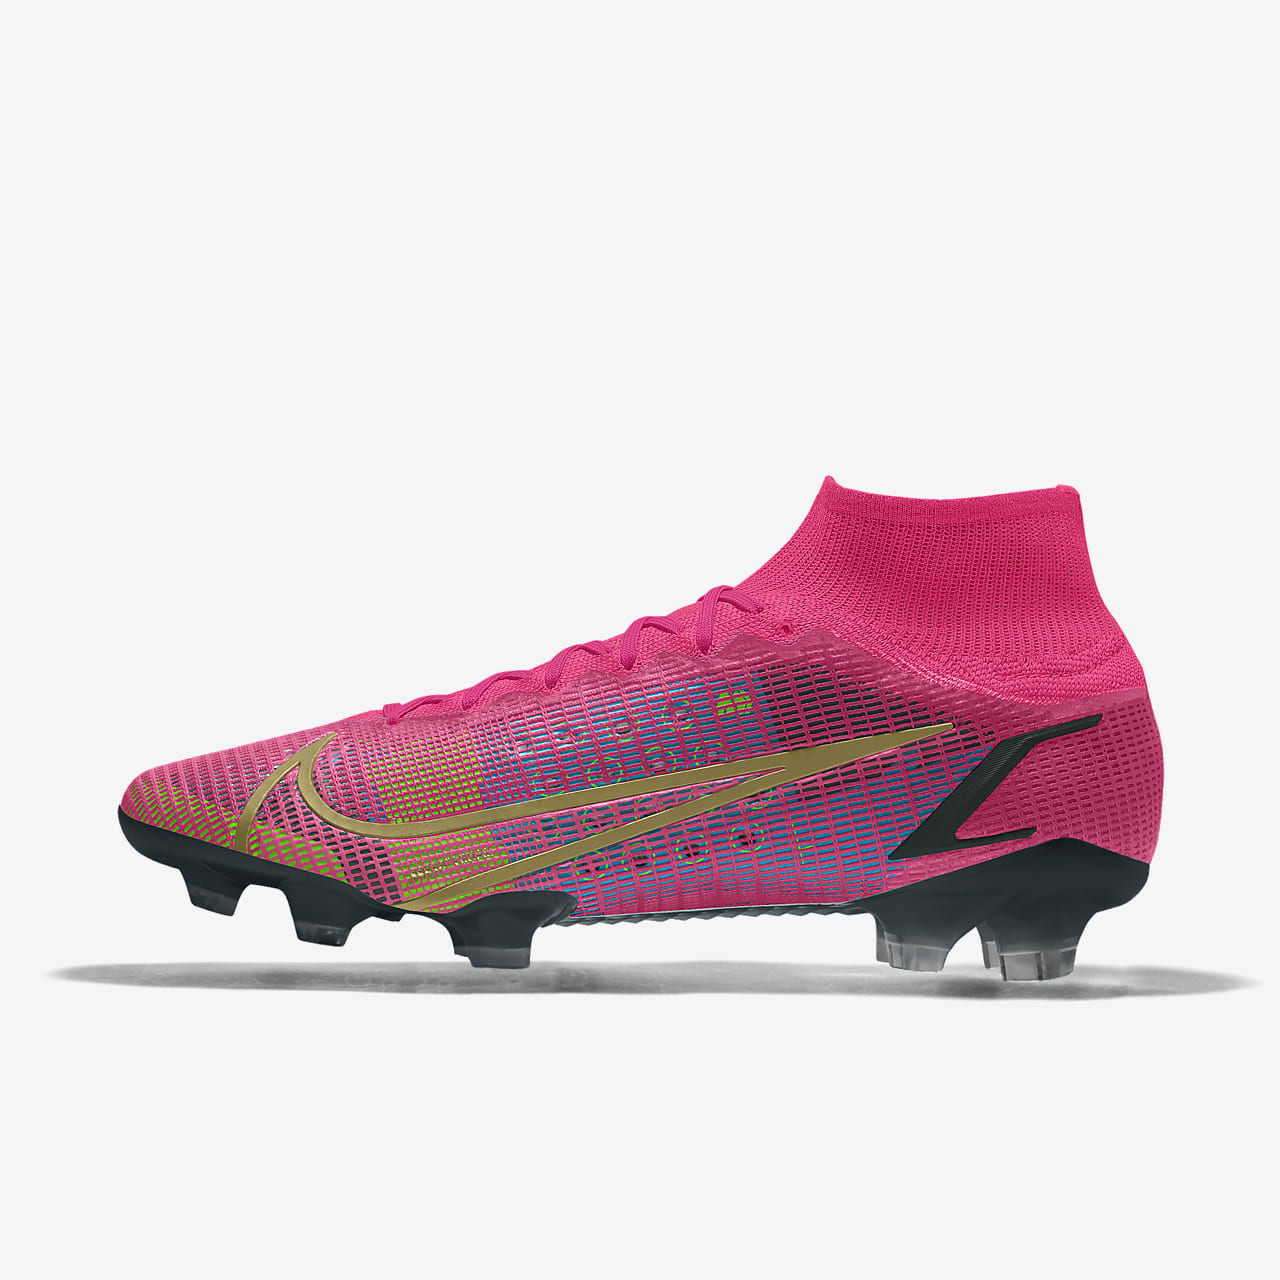 Specialdesignad fotbollssko Nike Mercurial Superfly 8 Elite By You